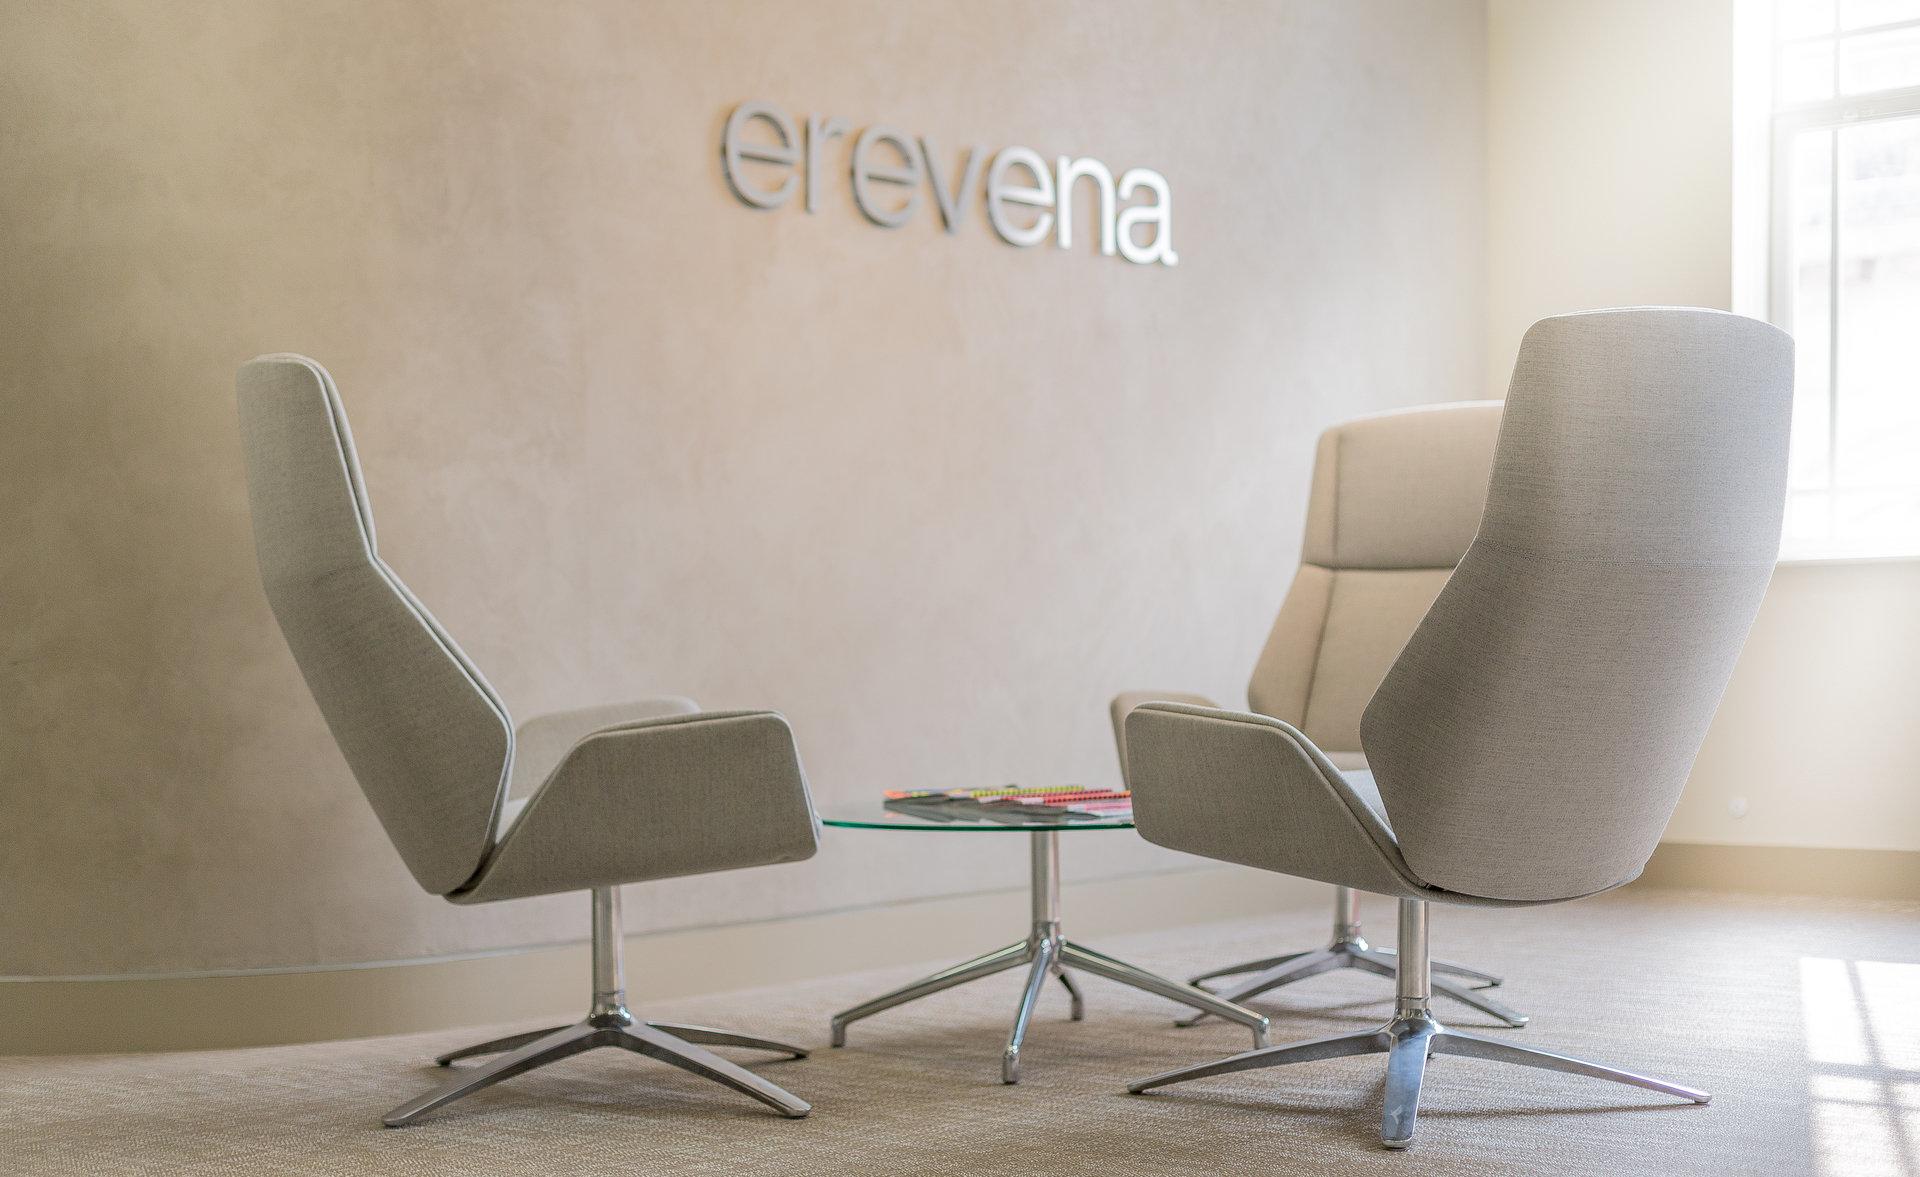 Erevena Appoints Former Boyden Global Head of Financial Services as Senior Partner